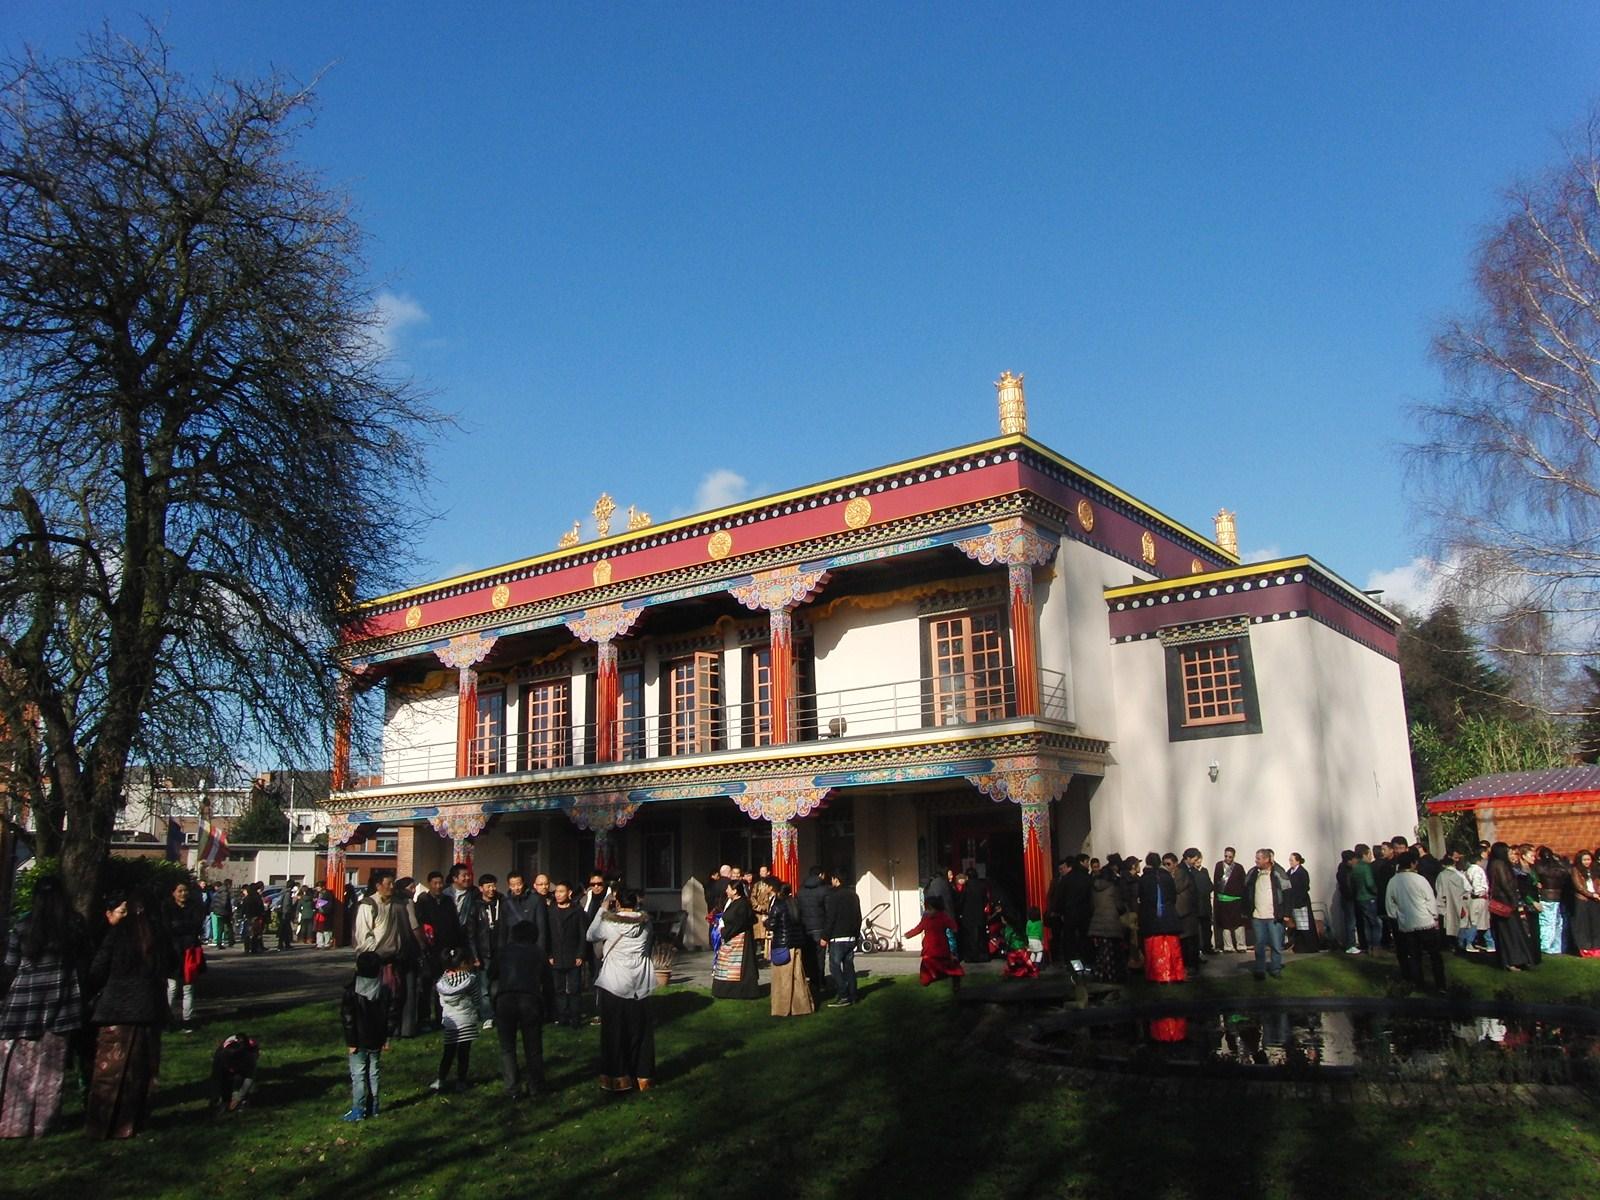 Losar foto 6; tempel buiten Schoten - losar - Bianca